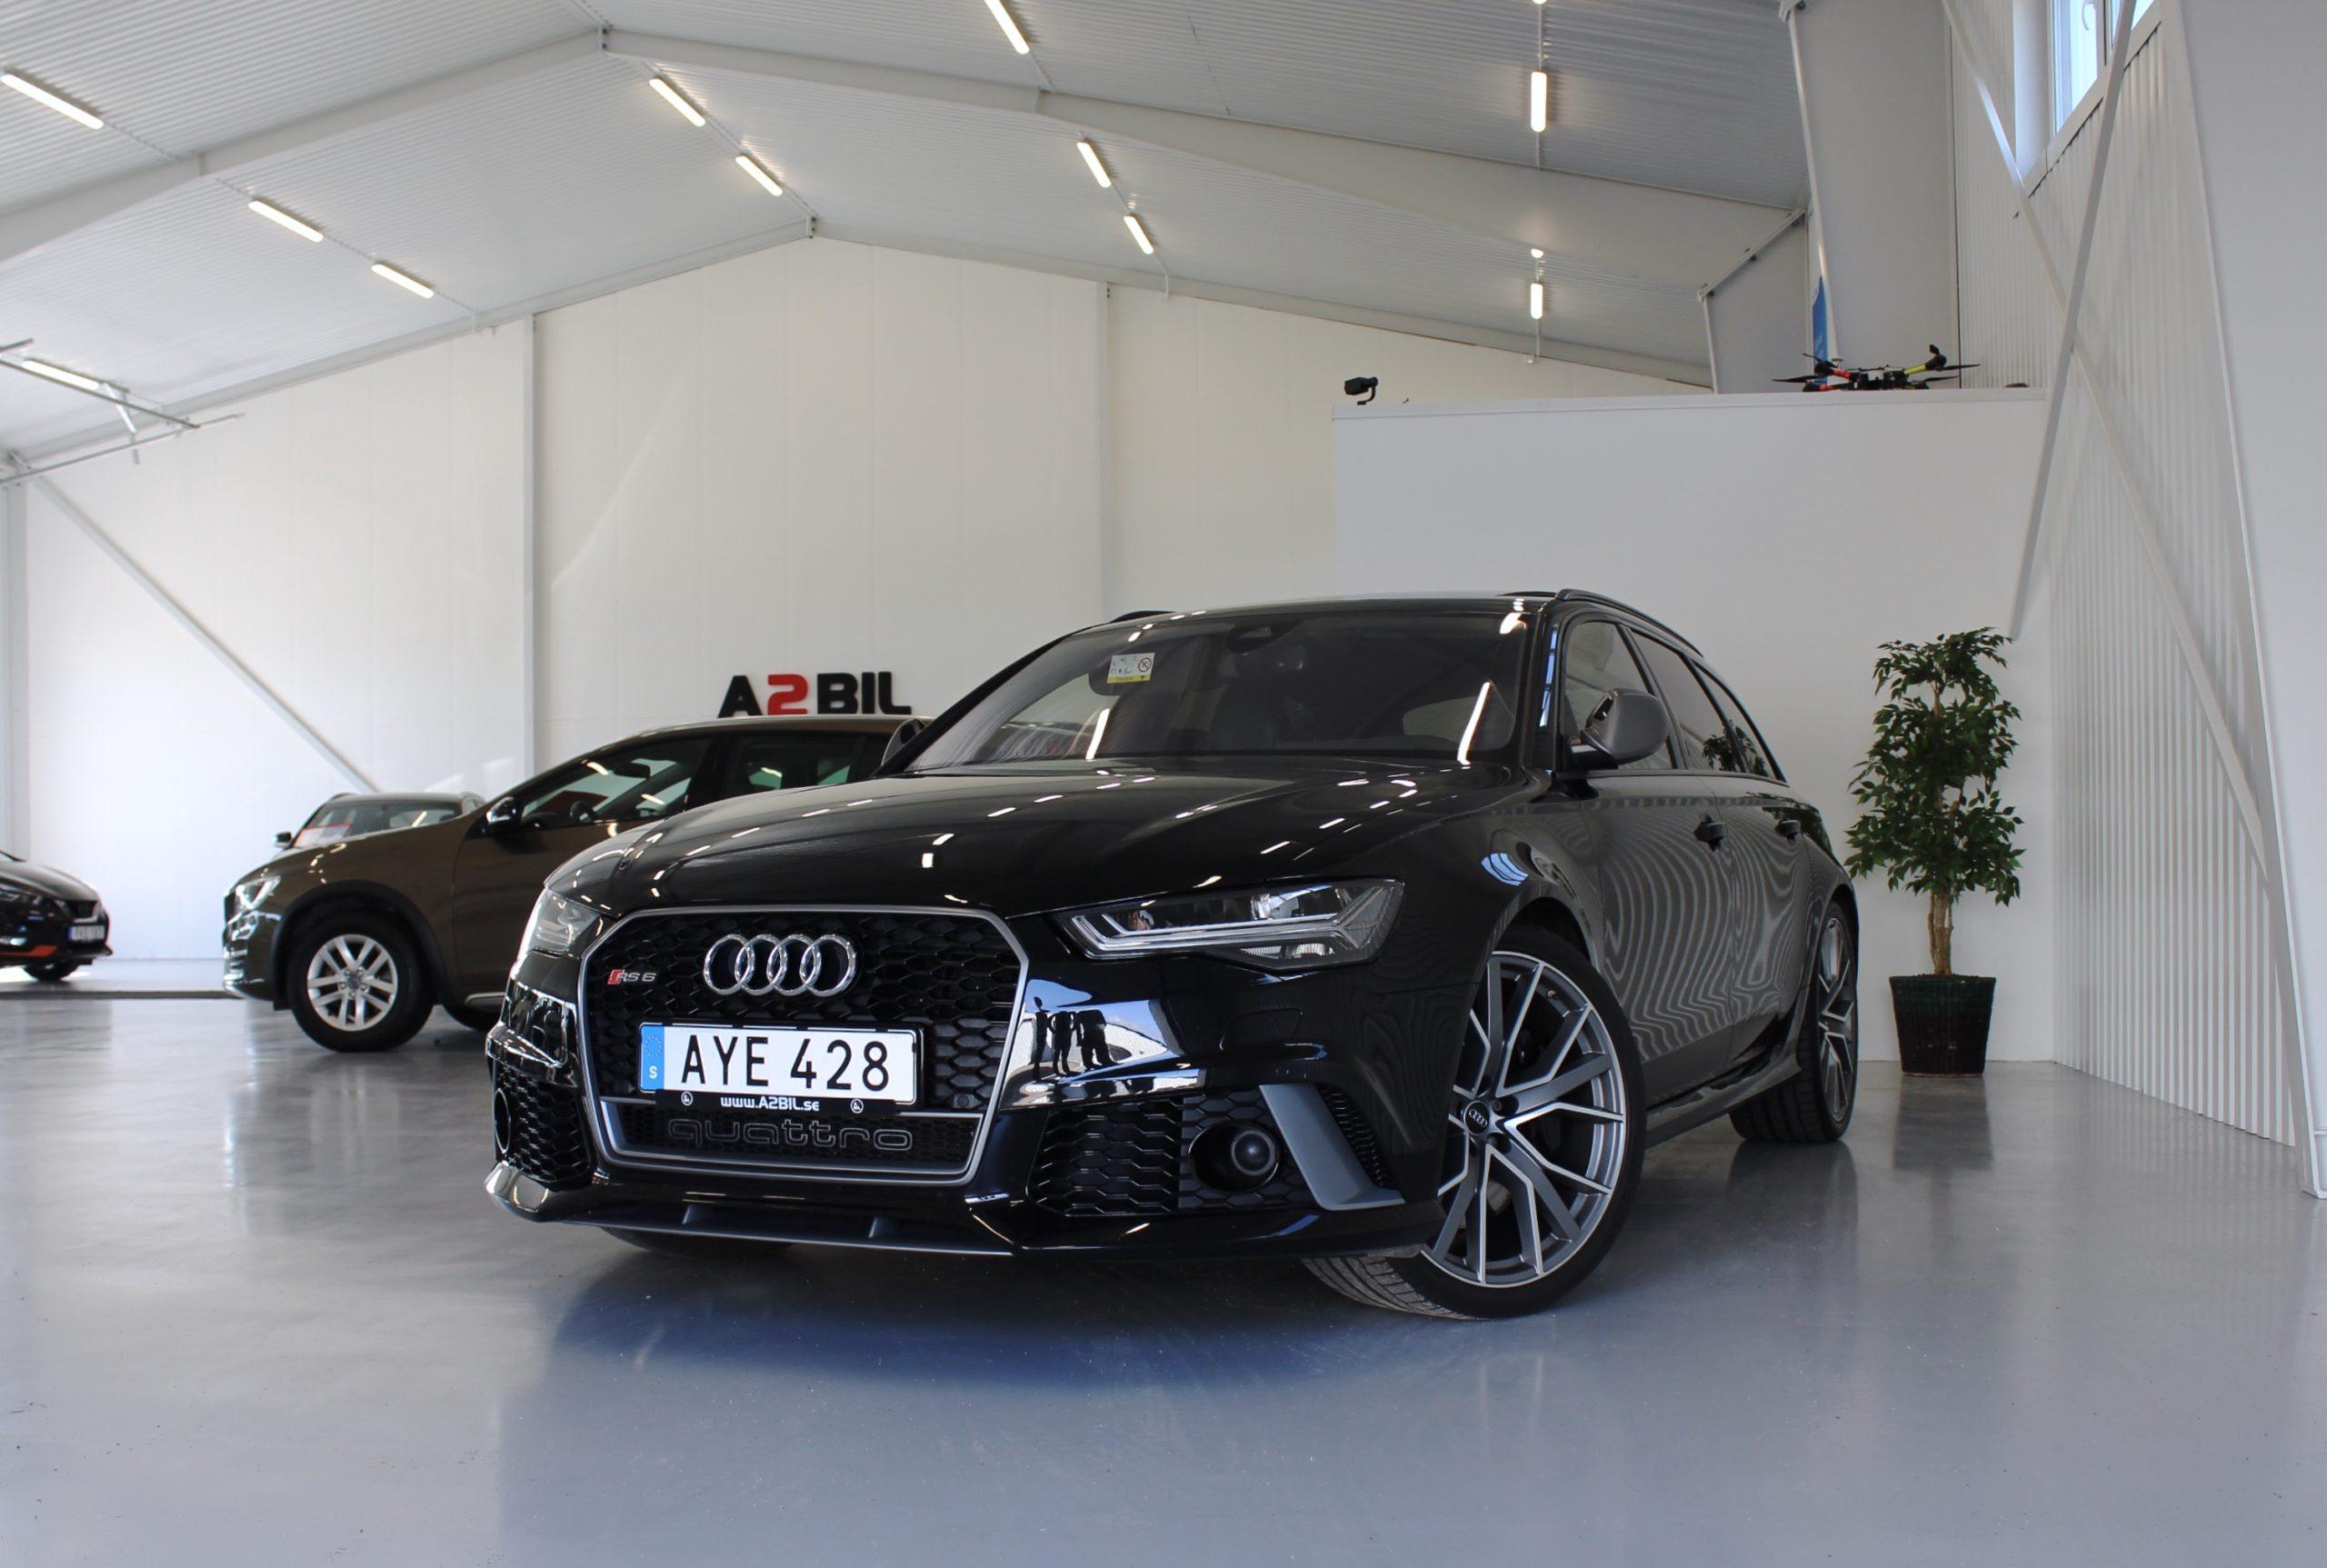 Audi RS6 Performance 4.0 TFSI V8 quattro 605hk SV